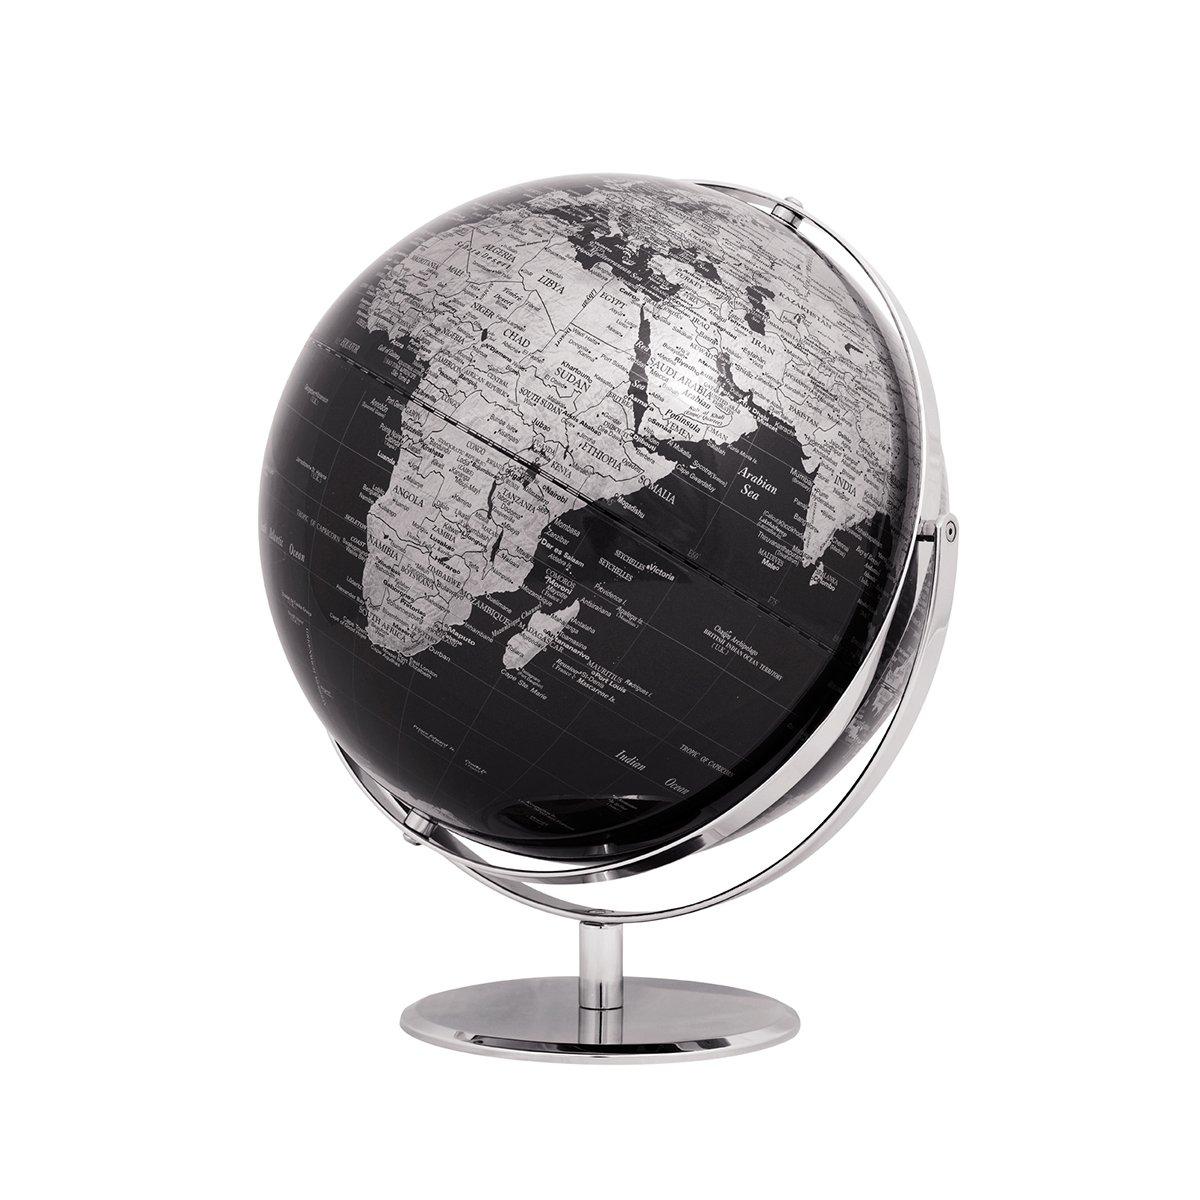 Emform Tischglobus Juri schwarz, Metall & Kunststoff, 300 x 360 mm